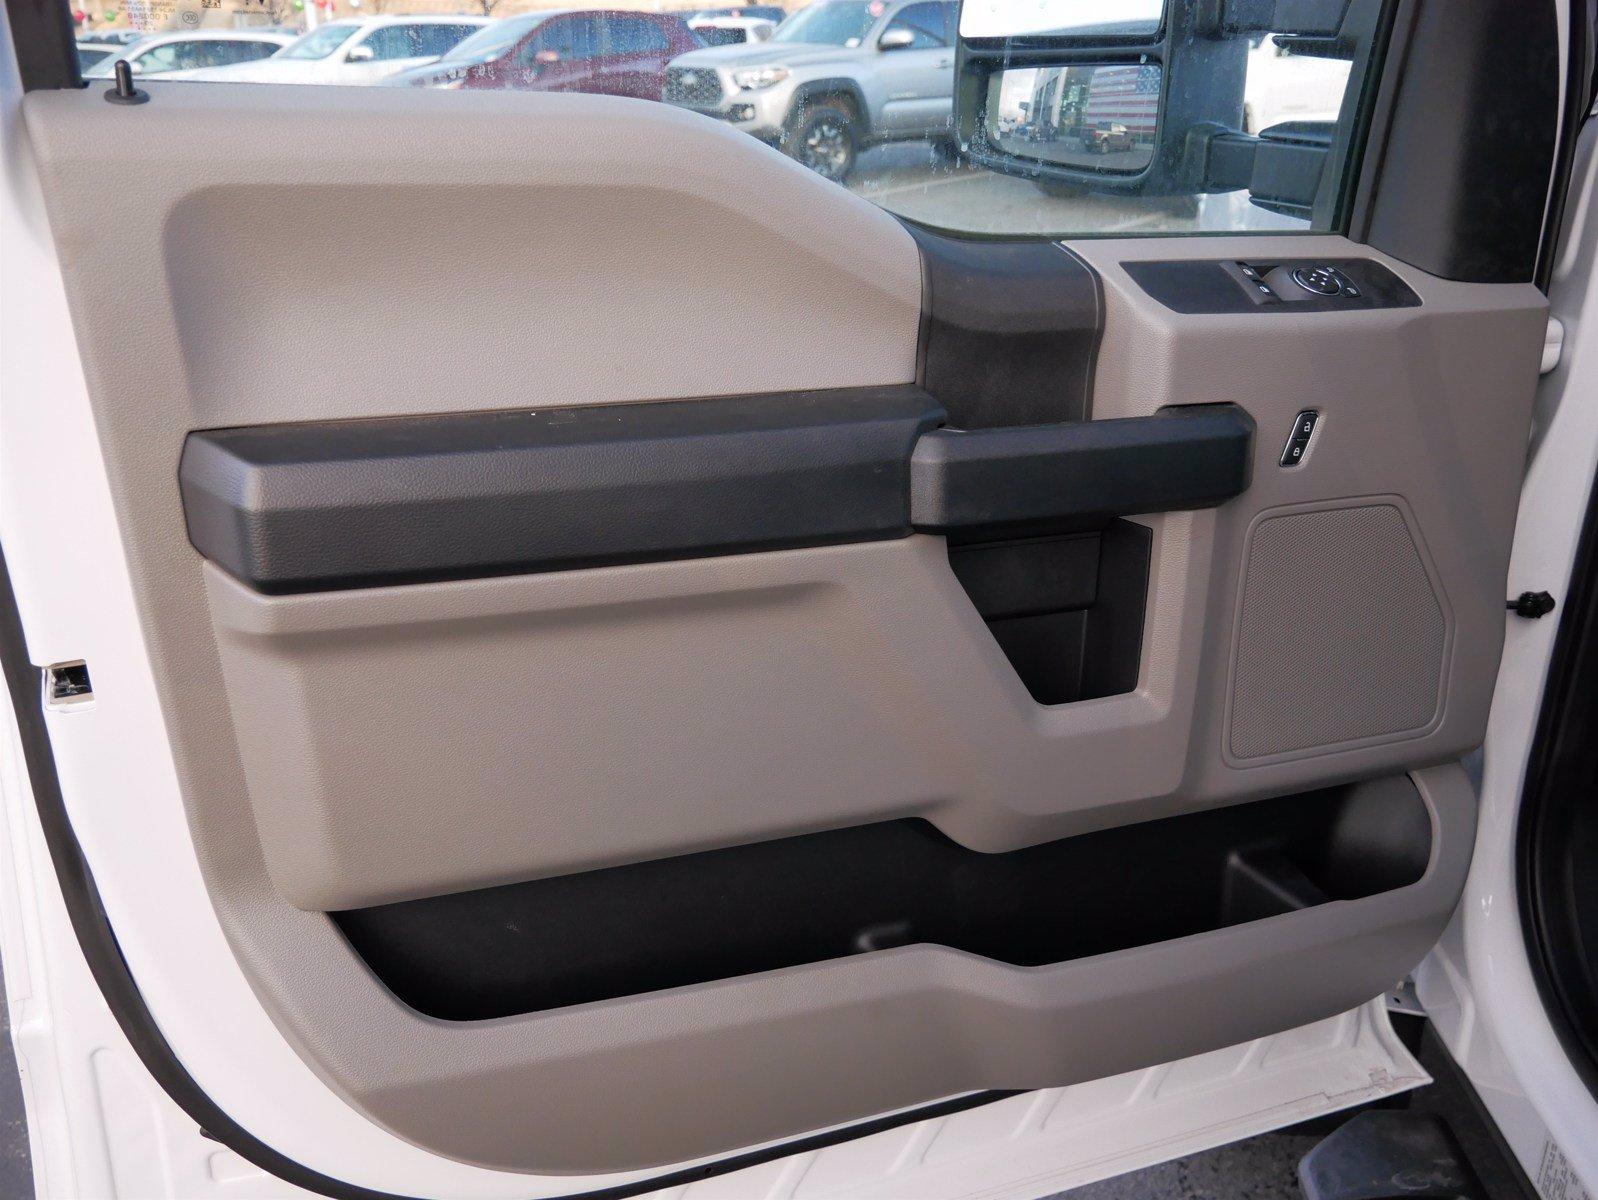 2020 Ford F-550 Regular Cab DRW AWD, Scelzi Dump Body #63233 - photo 11